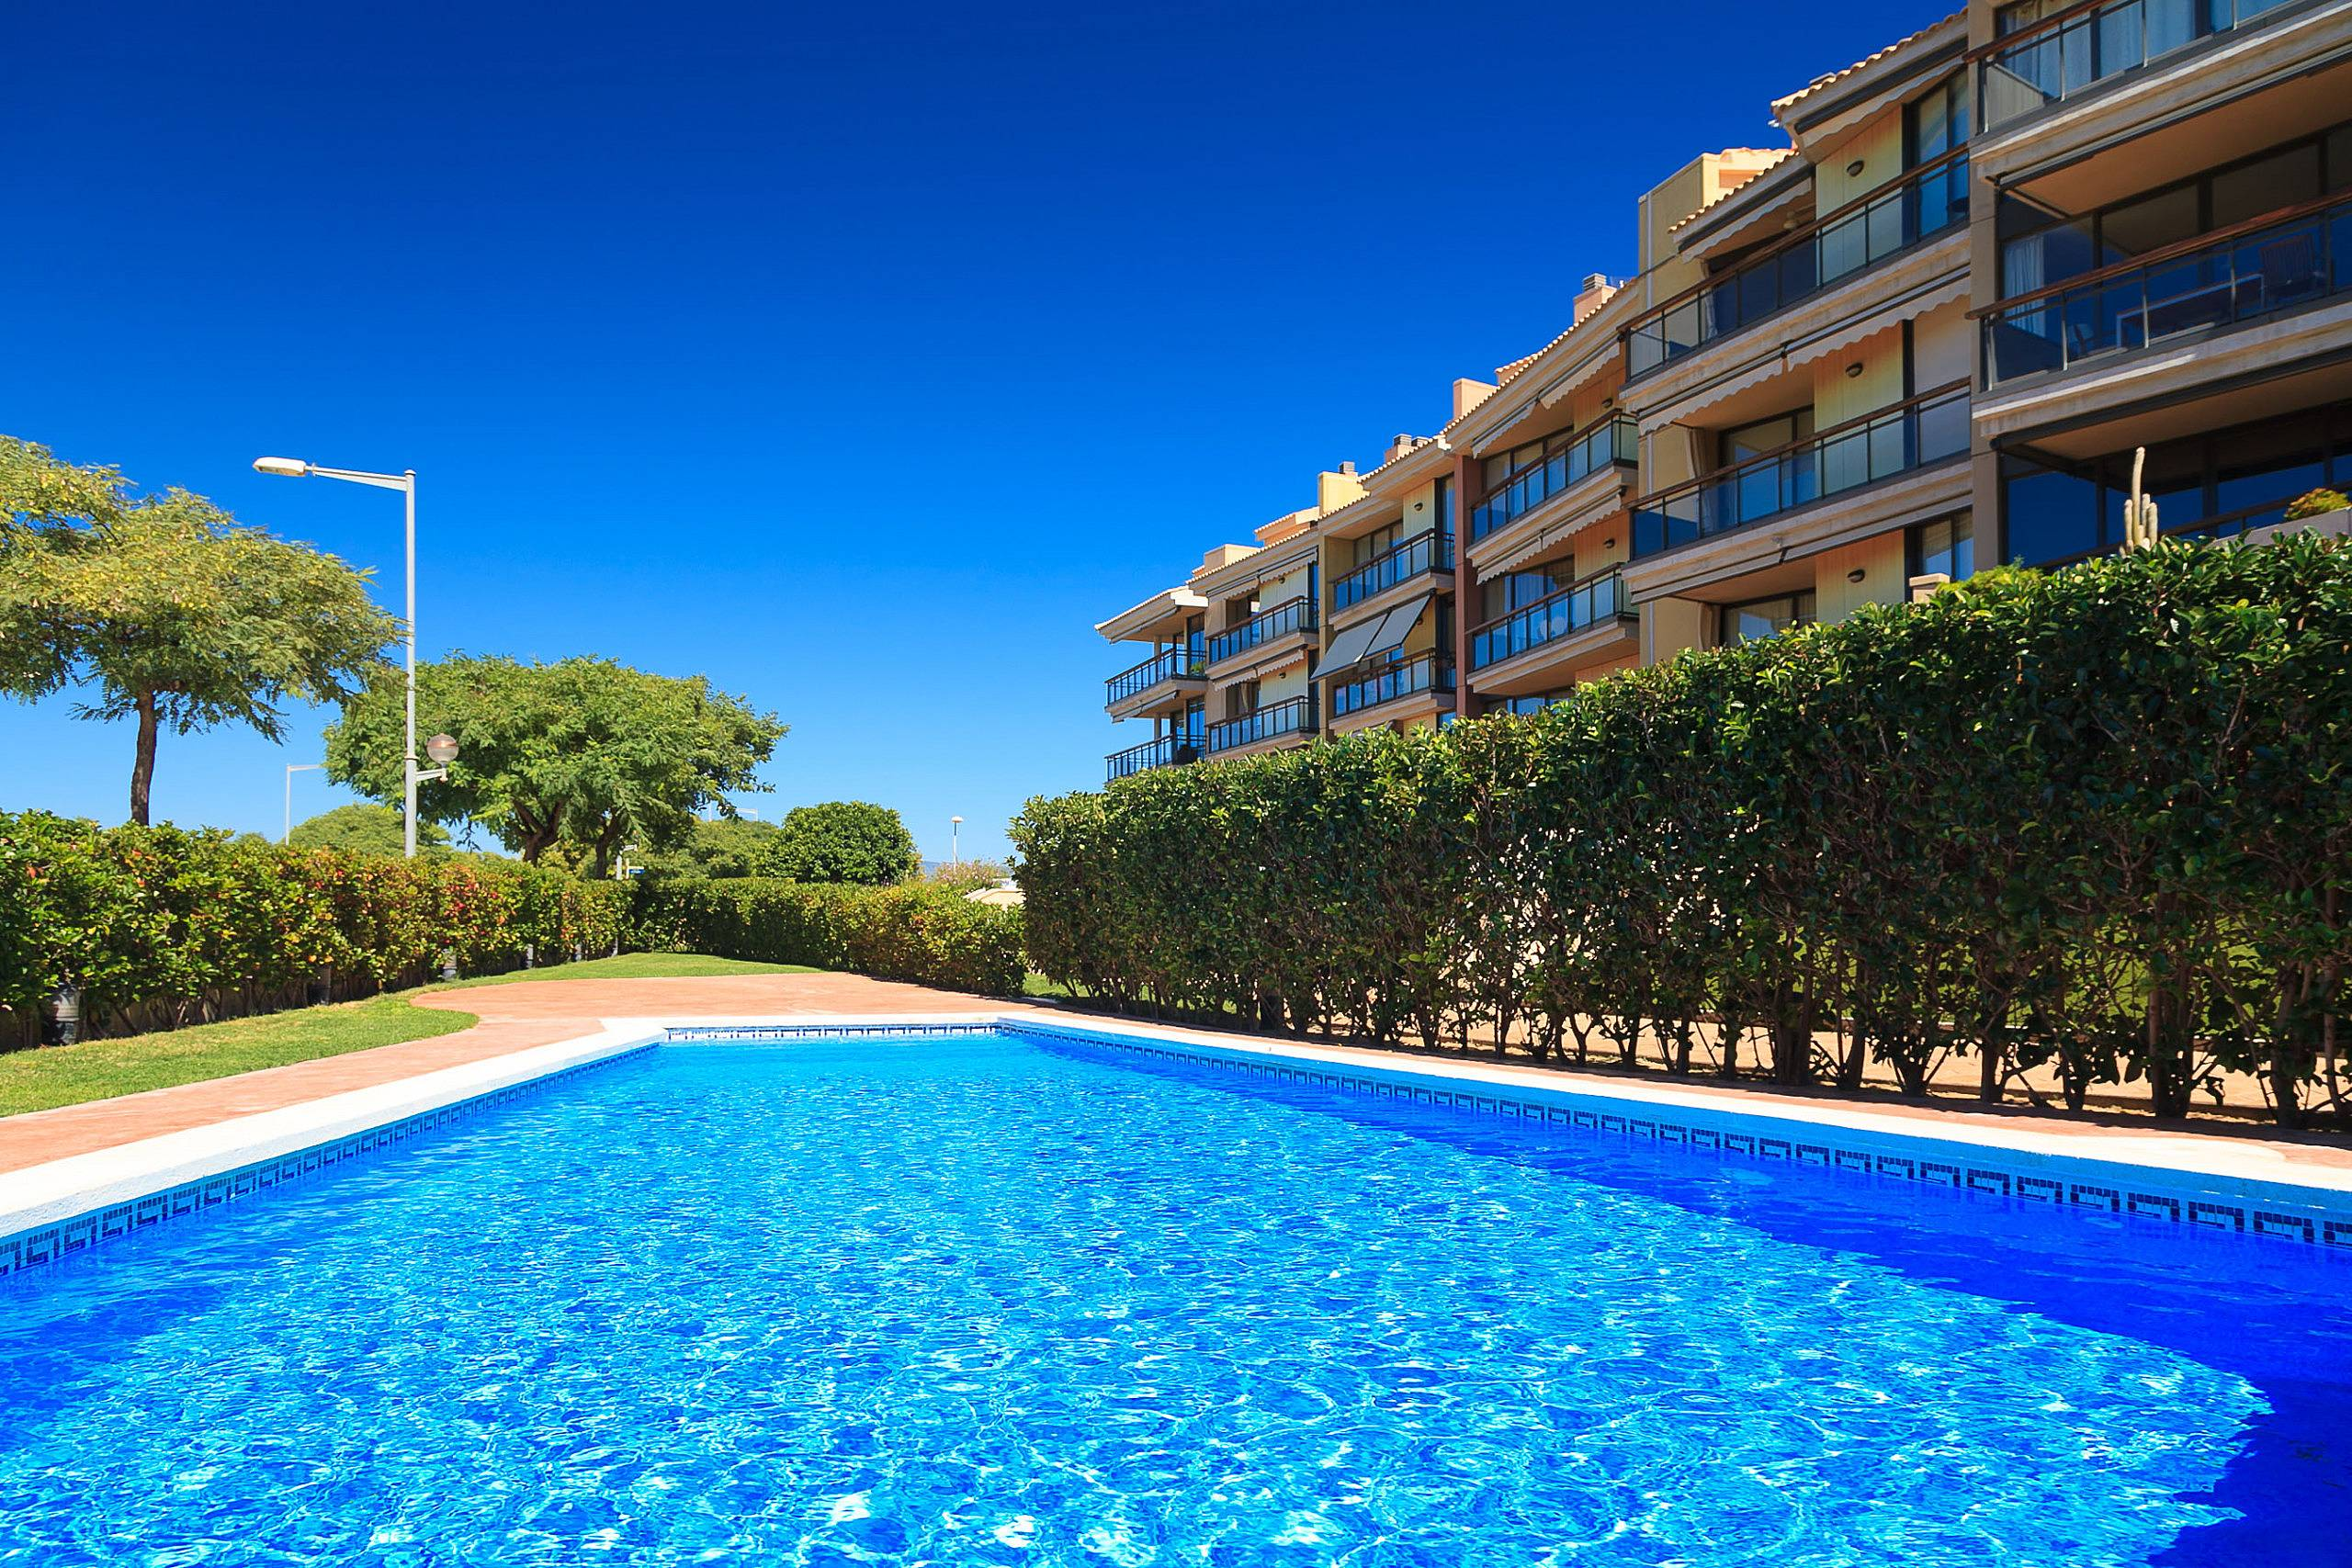 Alquiler apartamento ciutadella family complex en cambrils - Alquiler apartamento en cambrils ...